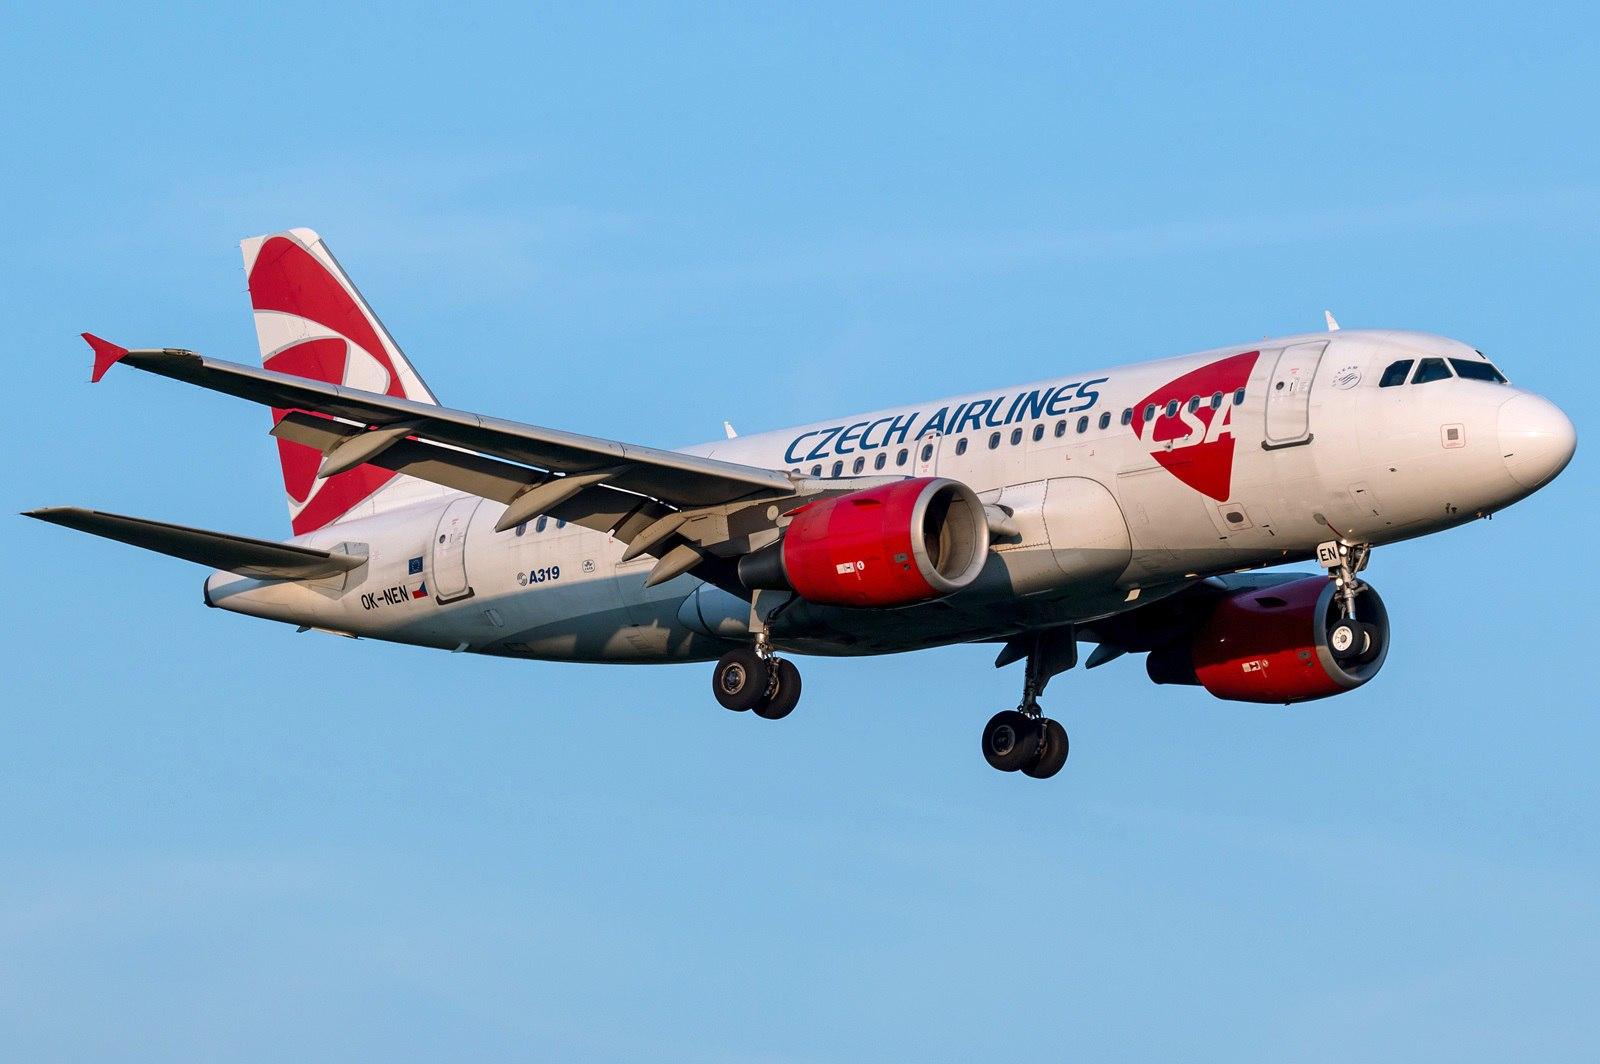 Airbus A319 национального перевозчика Чехии заходит на посадку